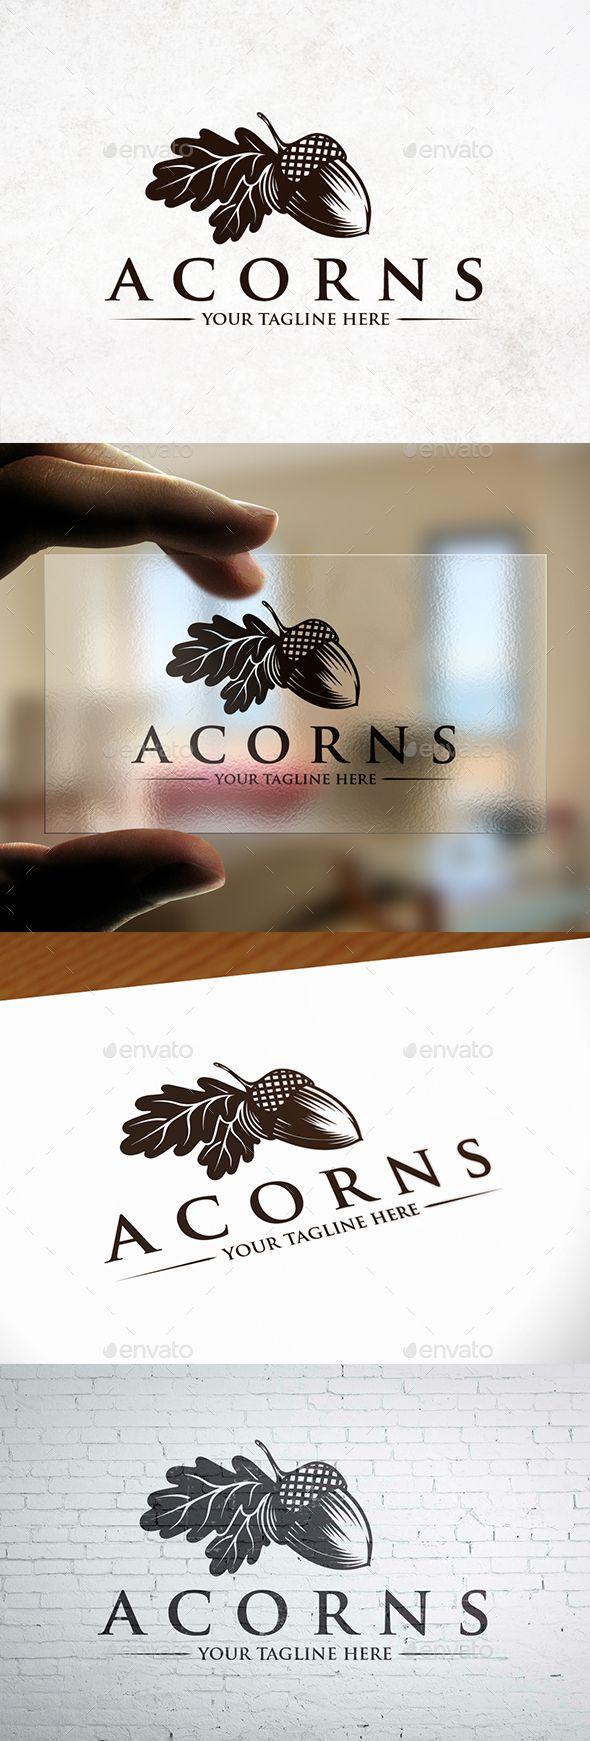 Creative Acorn Logo Template PSD, Vector EPS, AI